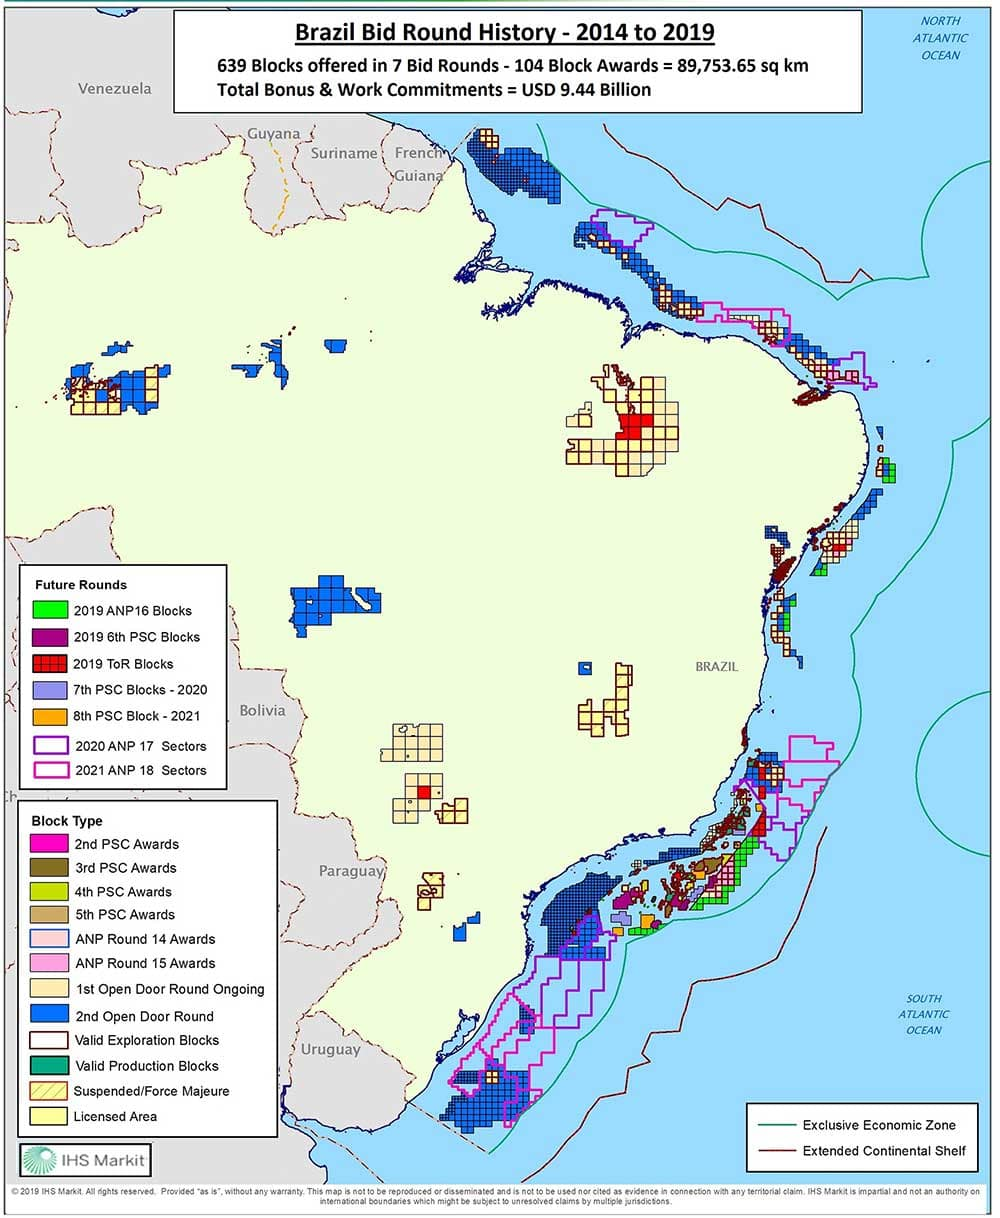 Brazil bid round history map